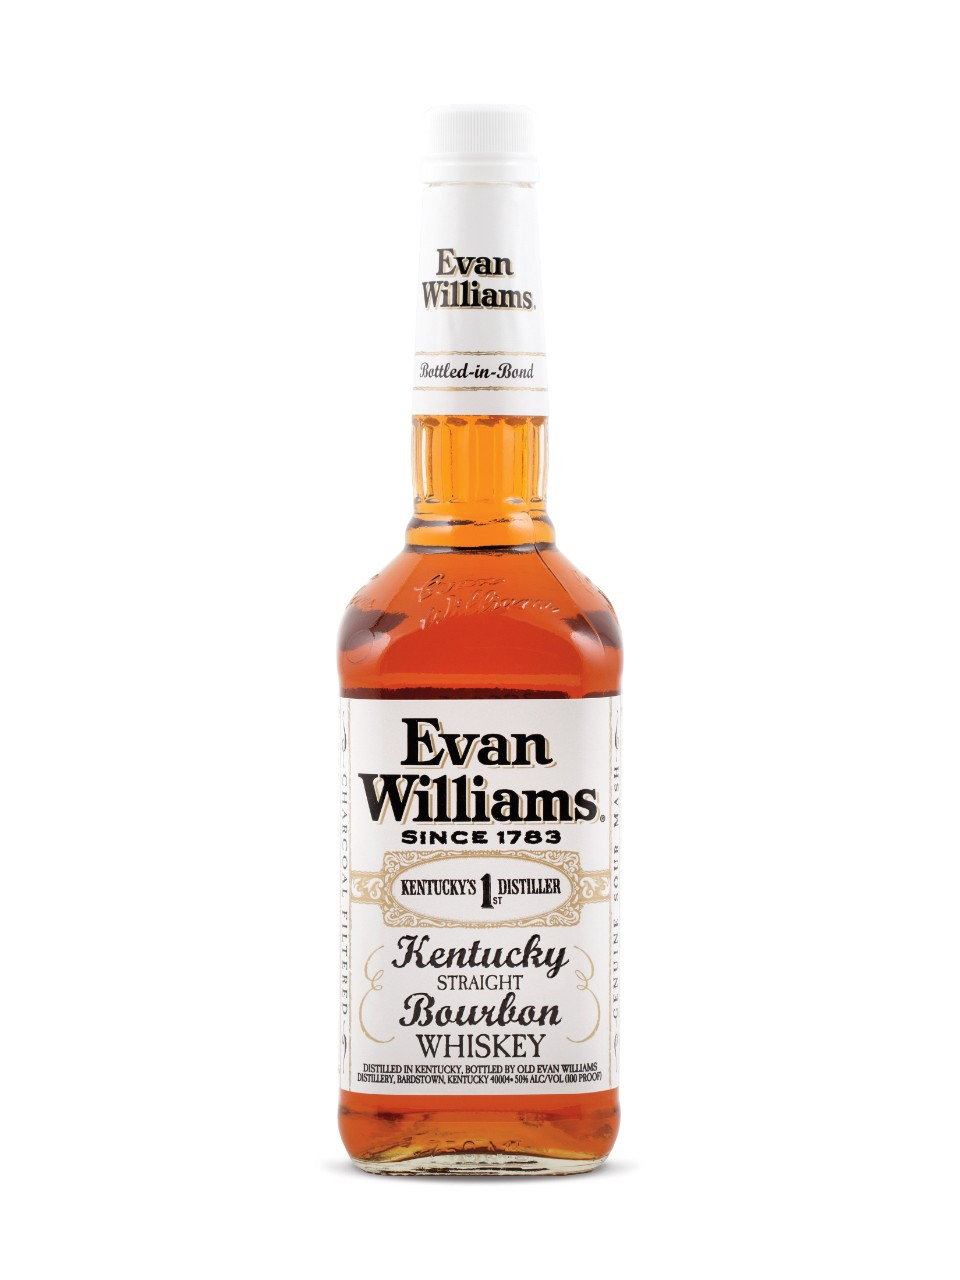 EW white bottle.jpeg